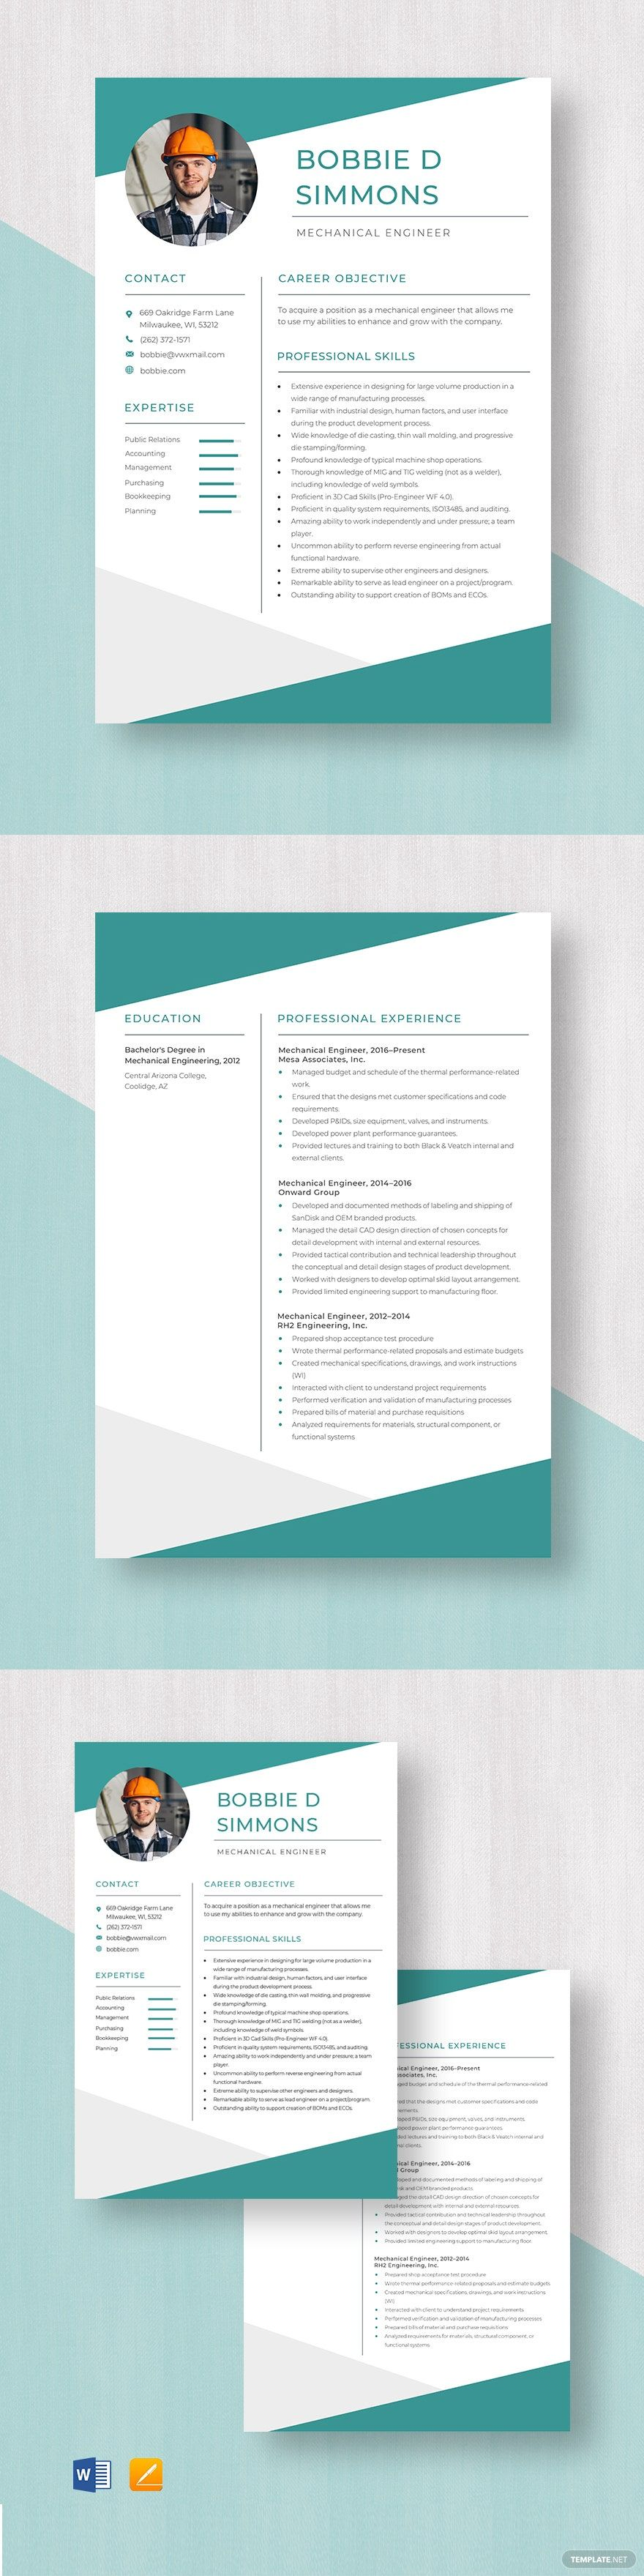 Doc engineer job mechanical opto resume